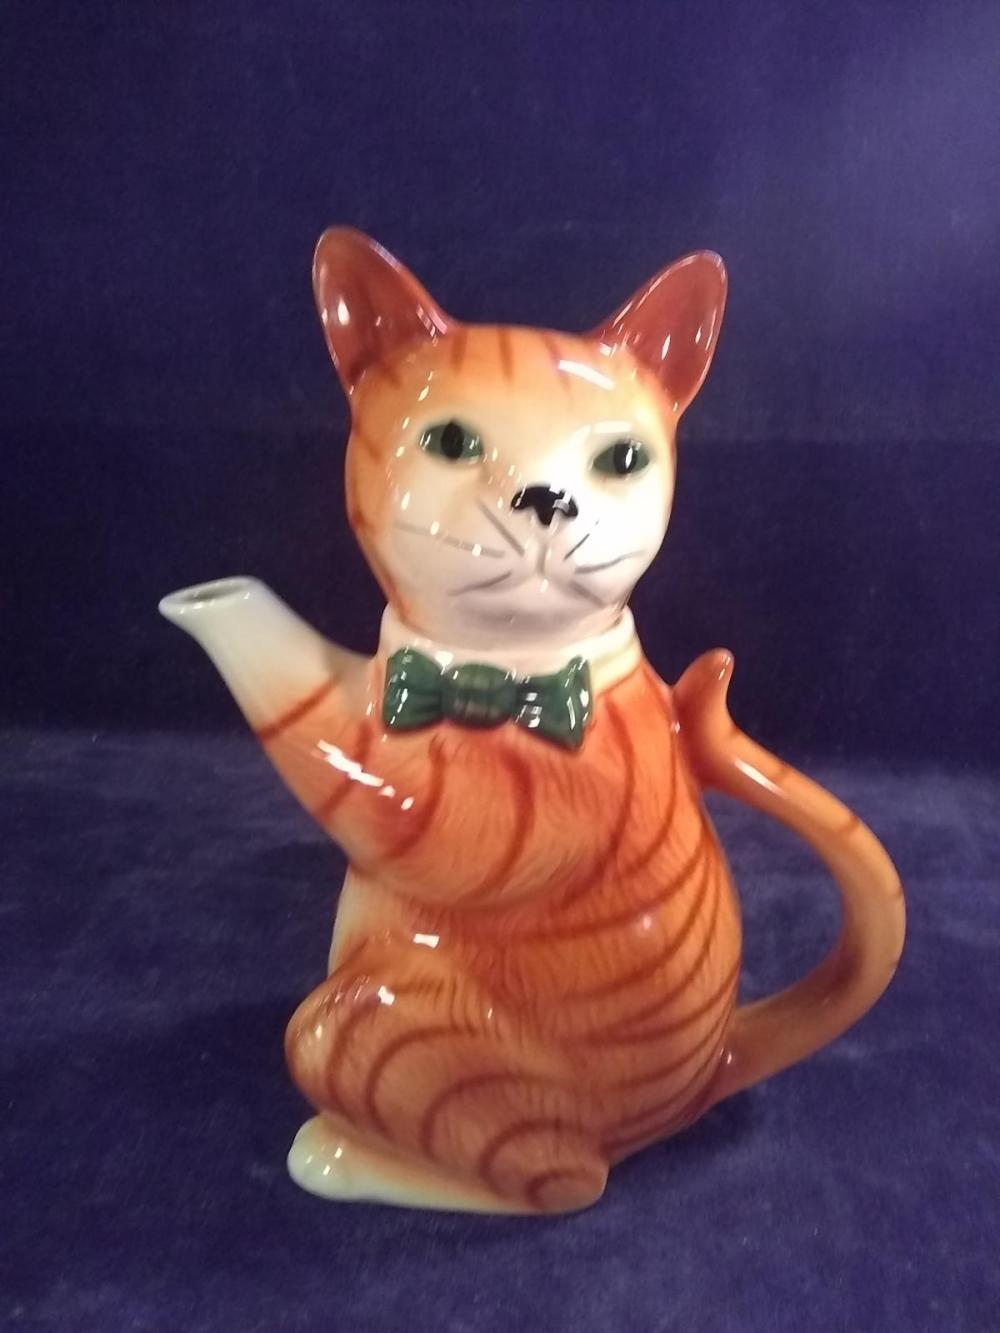 Wood Potter's of Burbles Cat Pitcher